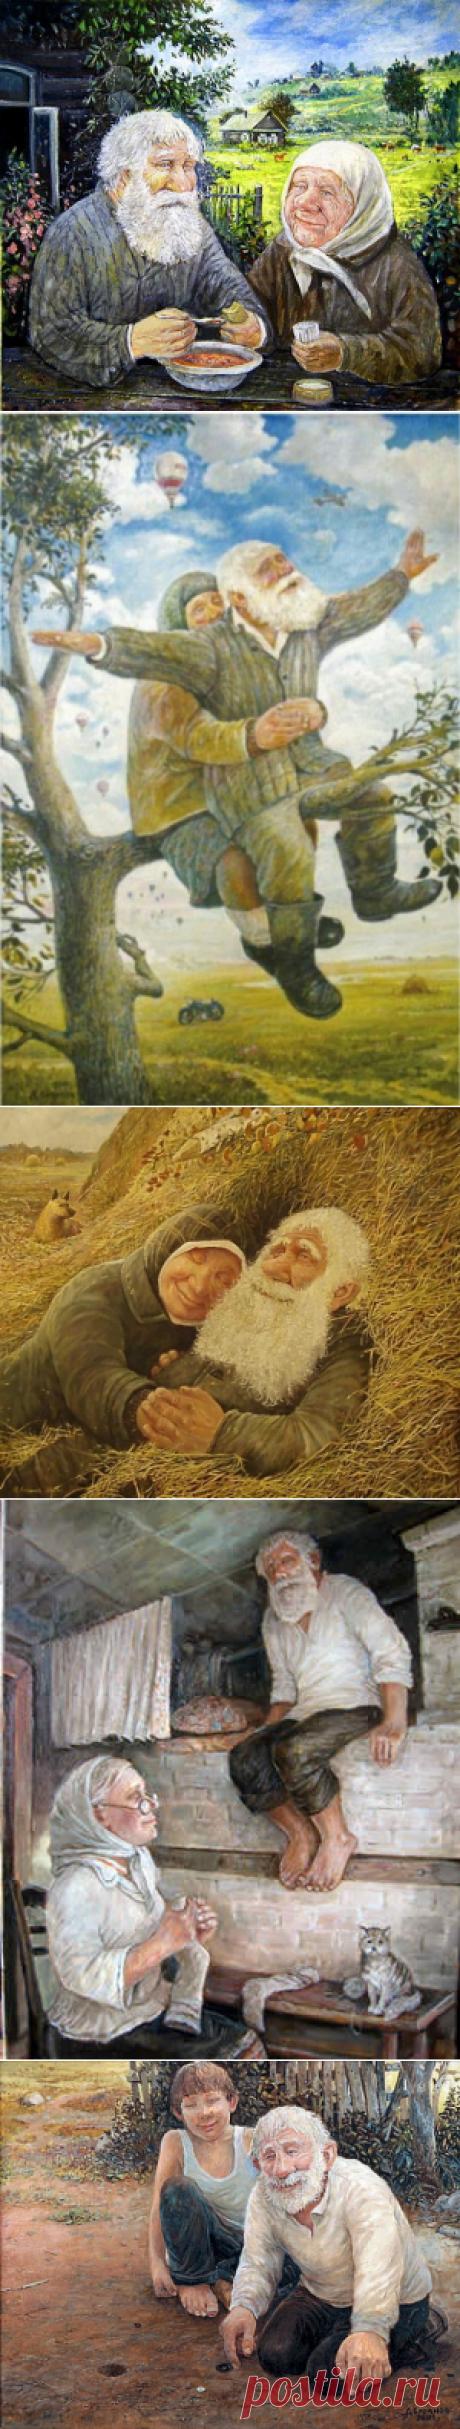 Дед да баба художника Леонида Баранова   Православие и мир